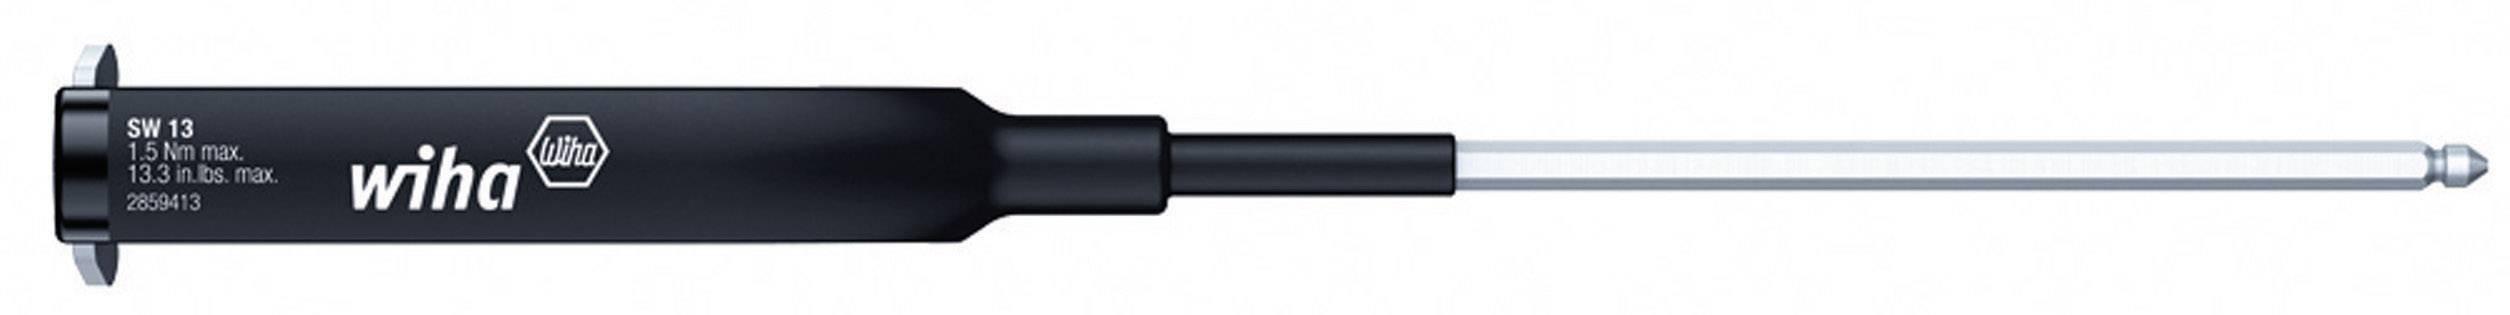 Bit momentového kľúča Wiha Torque 2859 36417, 218 mm